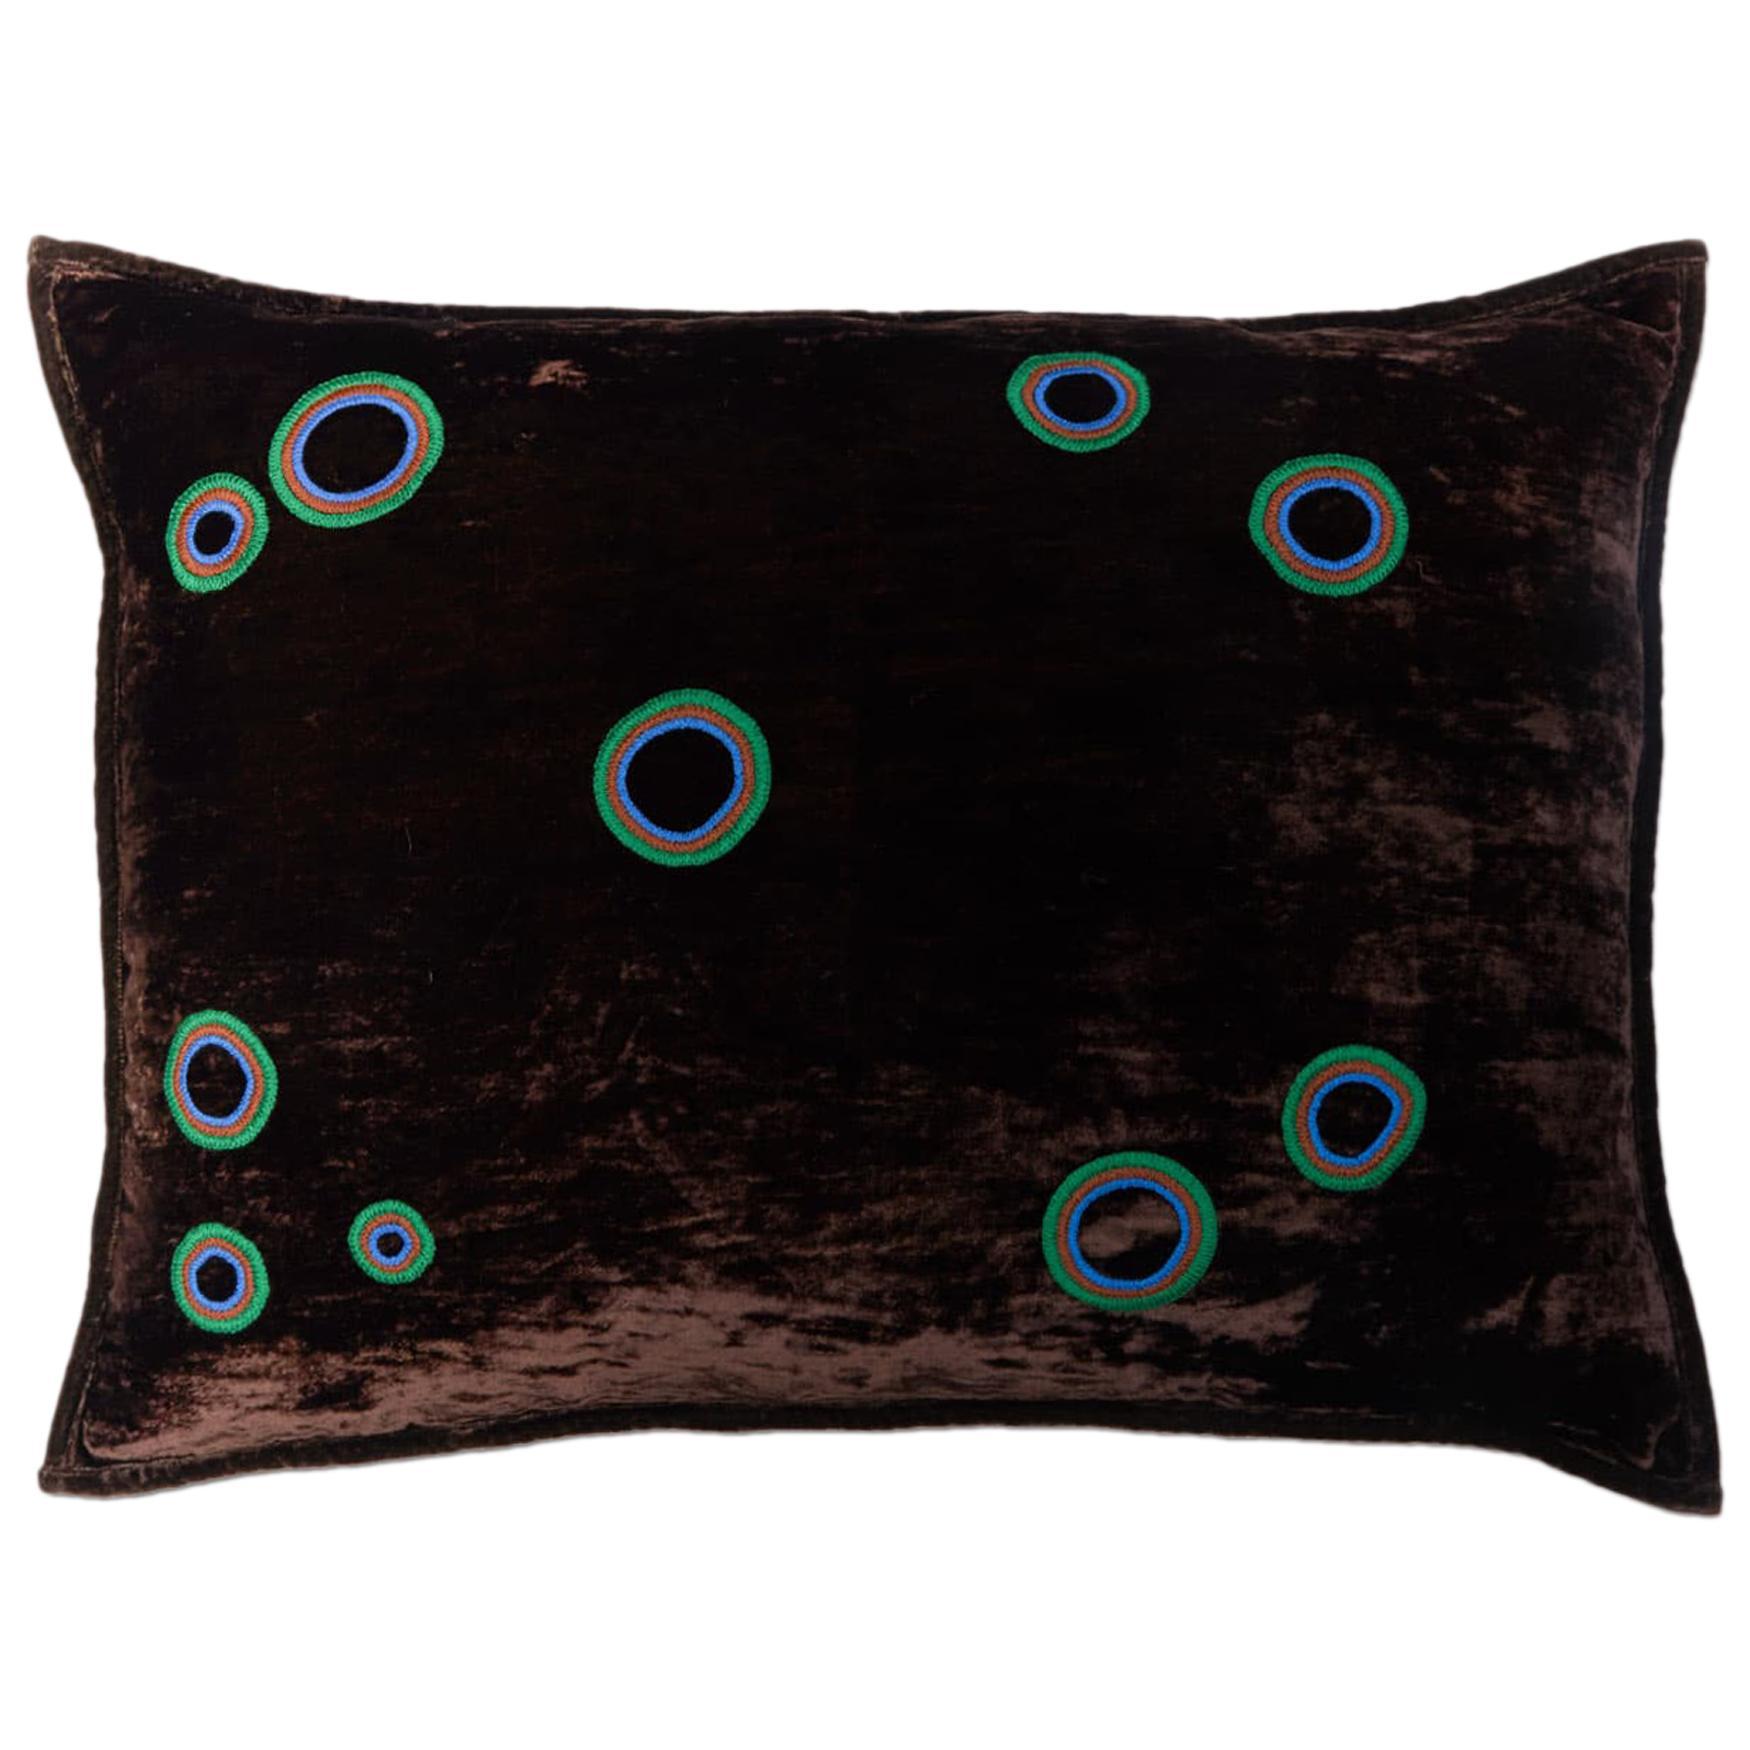 Ular Hand Embroidered Brown Velvet Pillow Cover